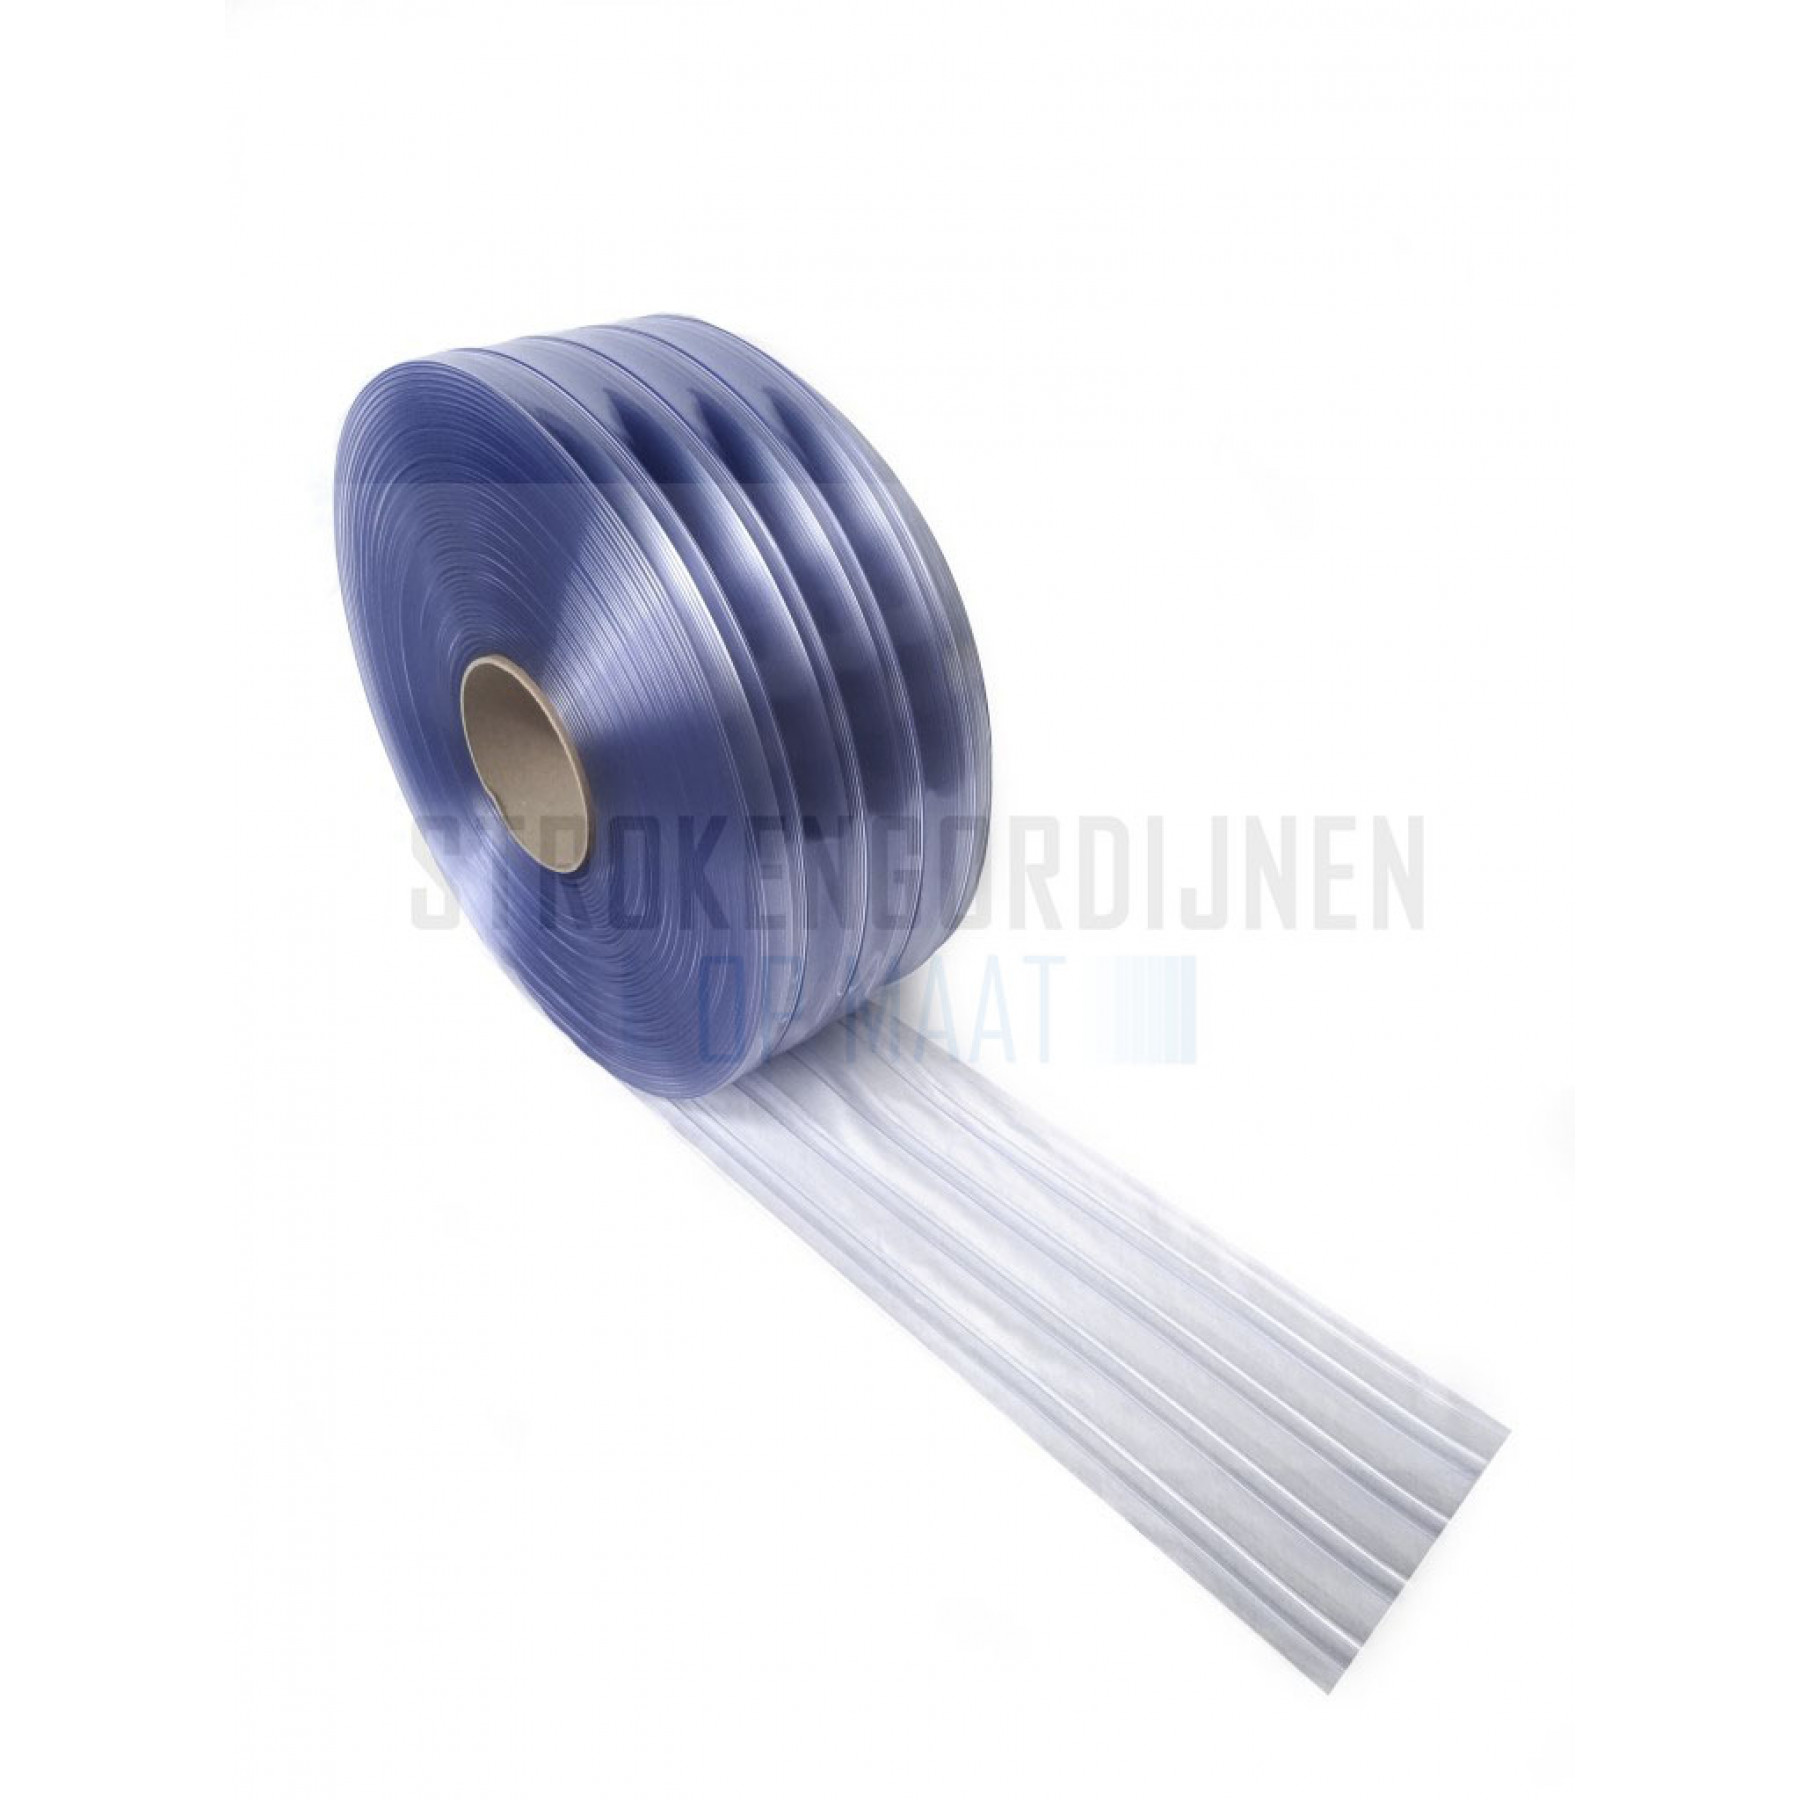 PVC Ribbed Rolle, 200mm breit, 2mm dick, 50 Meter lang, transparent